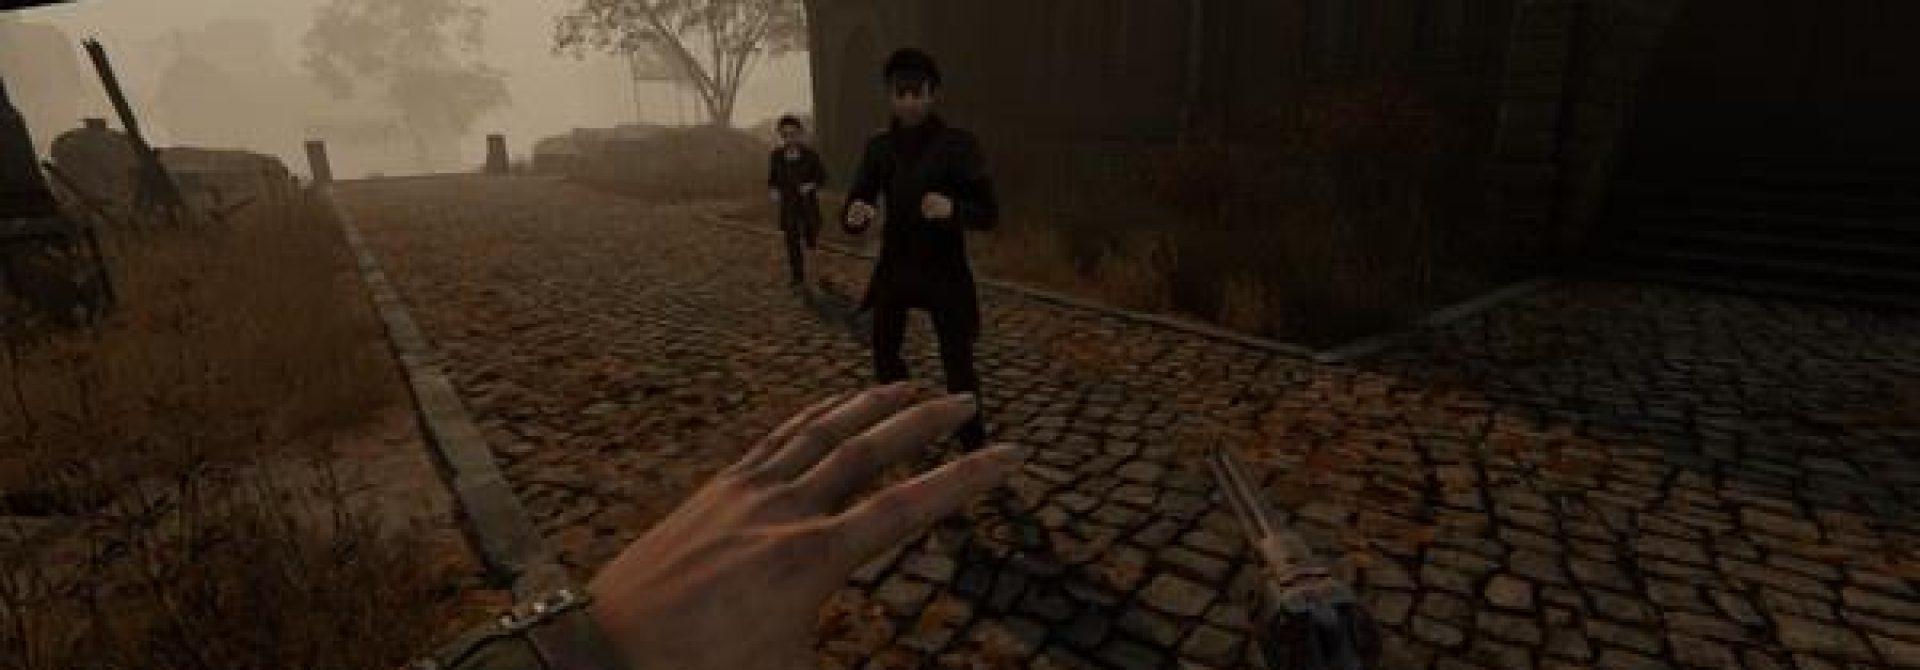 "Pathologic 2 Gains DLC Follow-up ""The Marble Nest"""